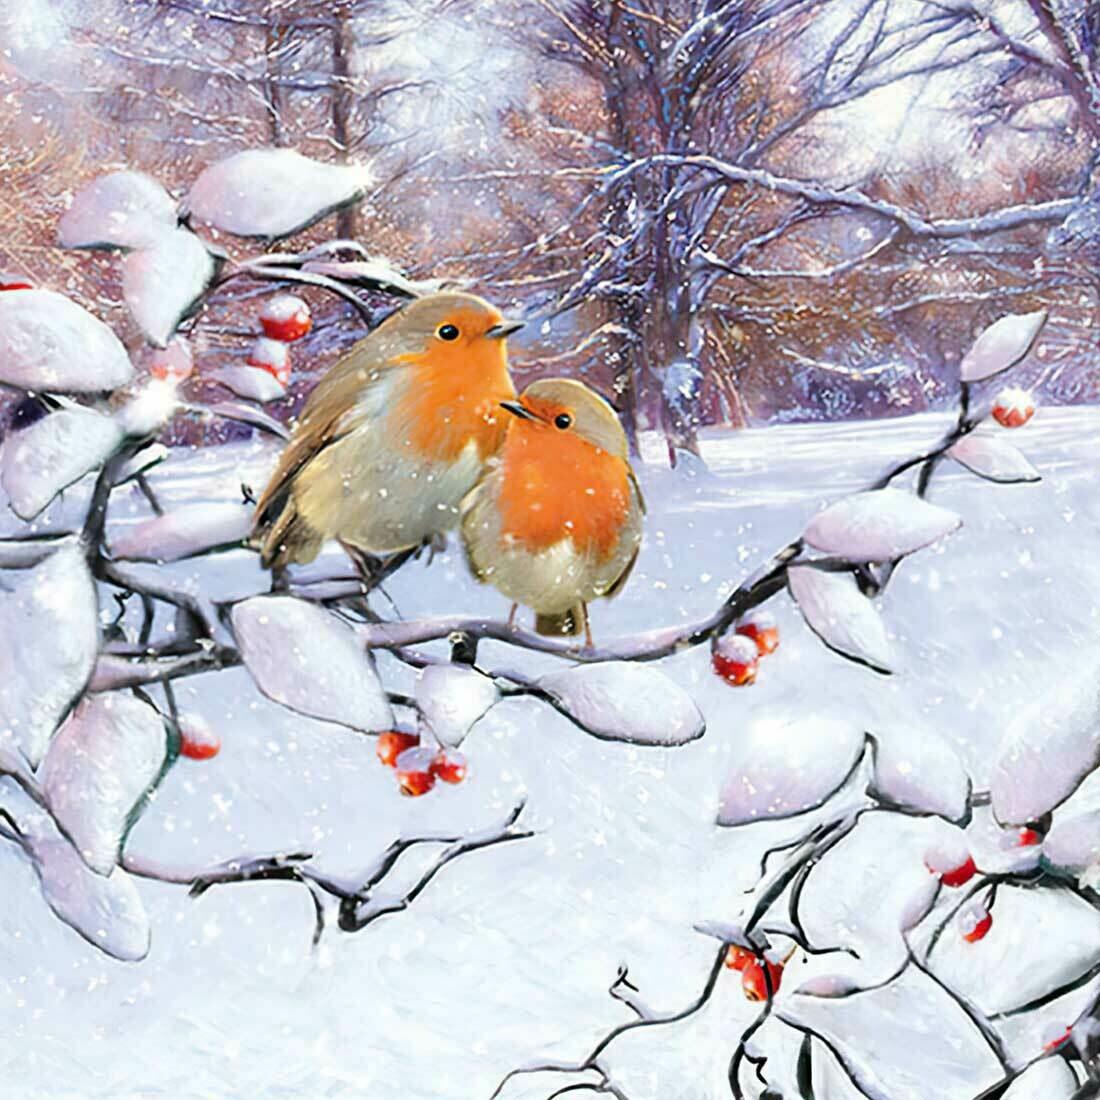 Decoupage Paper Napkins - Bird - Robins On Branch (1 Sheet)